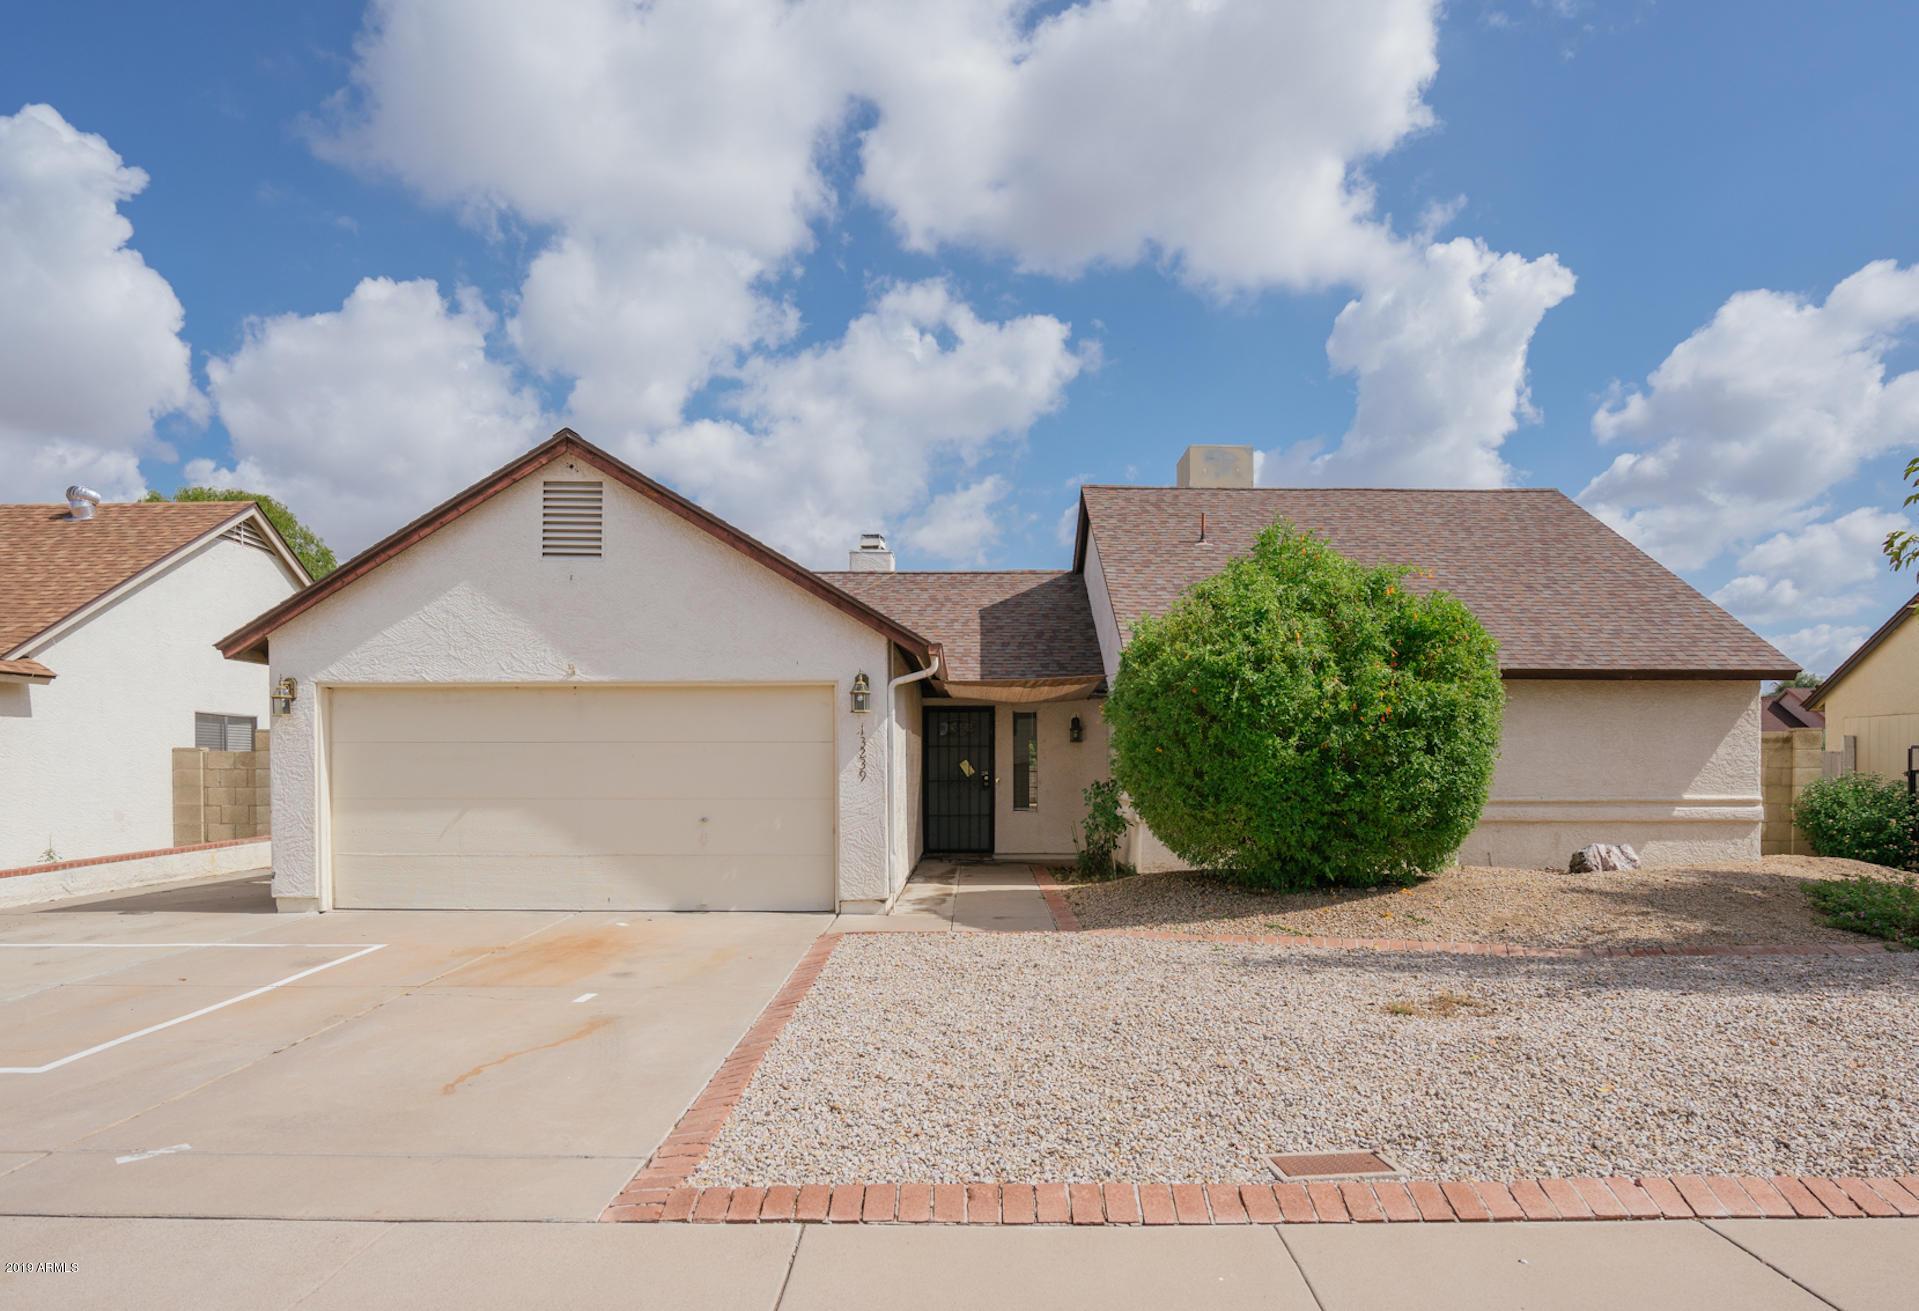 Photo of 13239 N 56TH Avenue, Glendale, AZ 85304